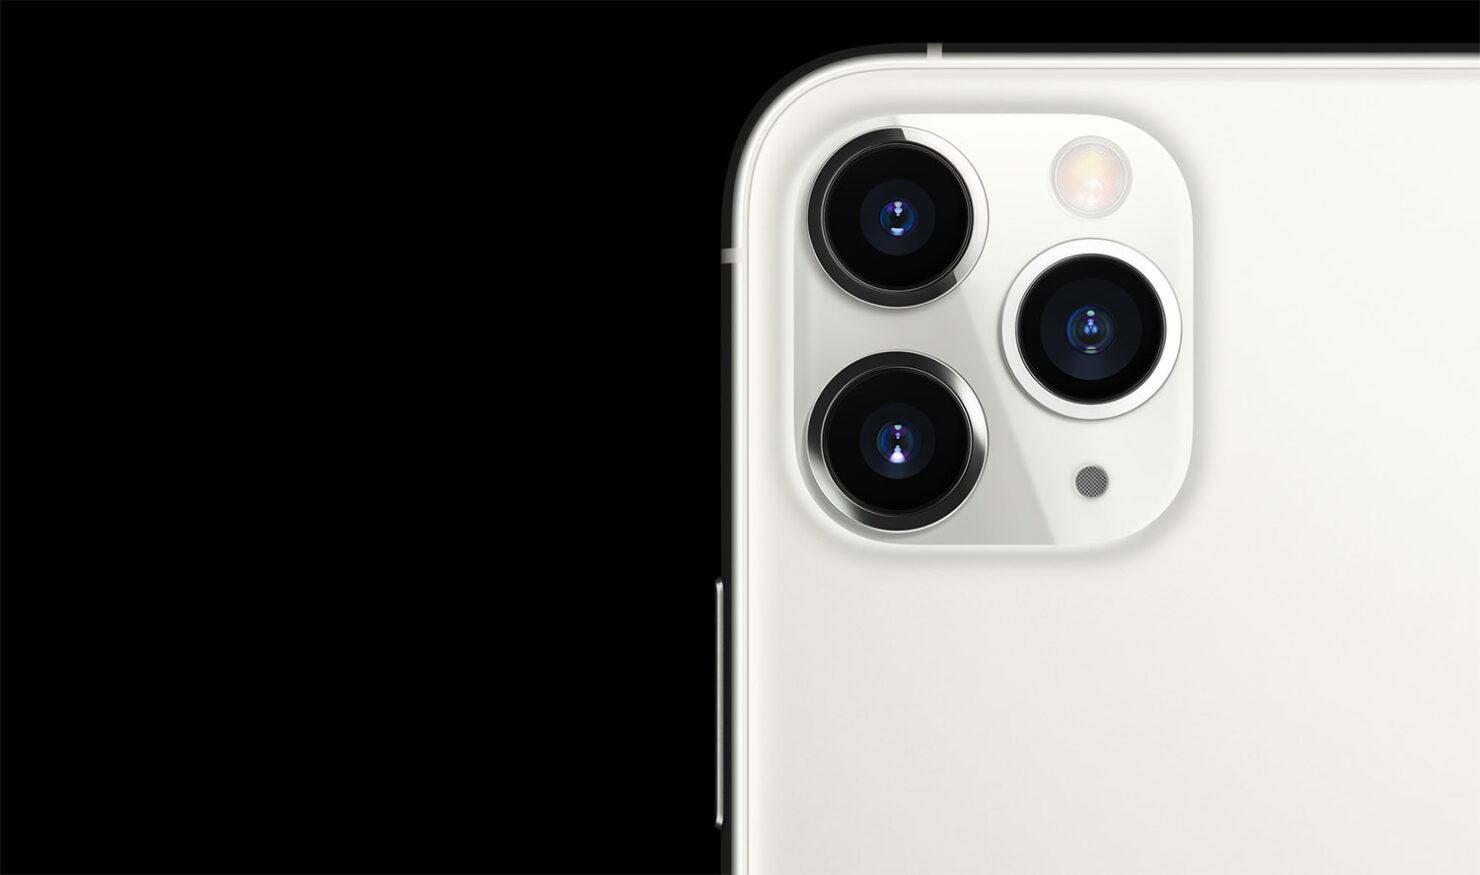 Austin Mann, a travel photographer praises the iPhone 11 Pro camera